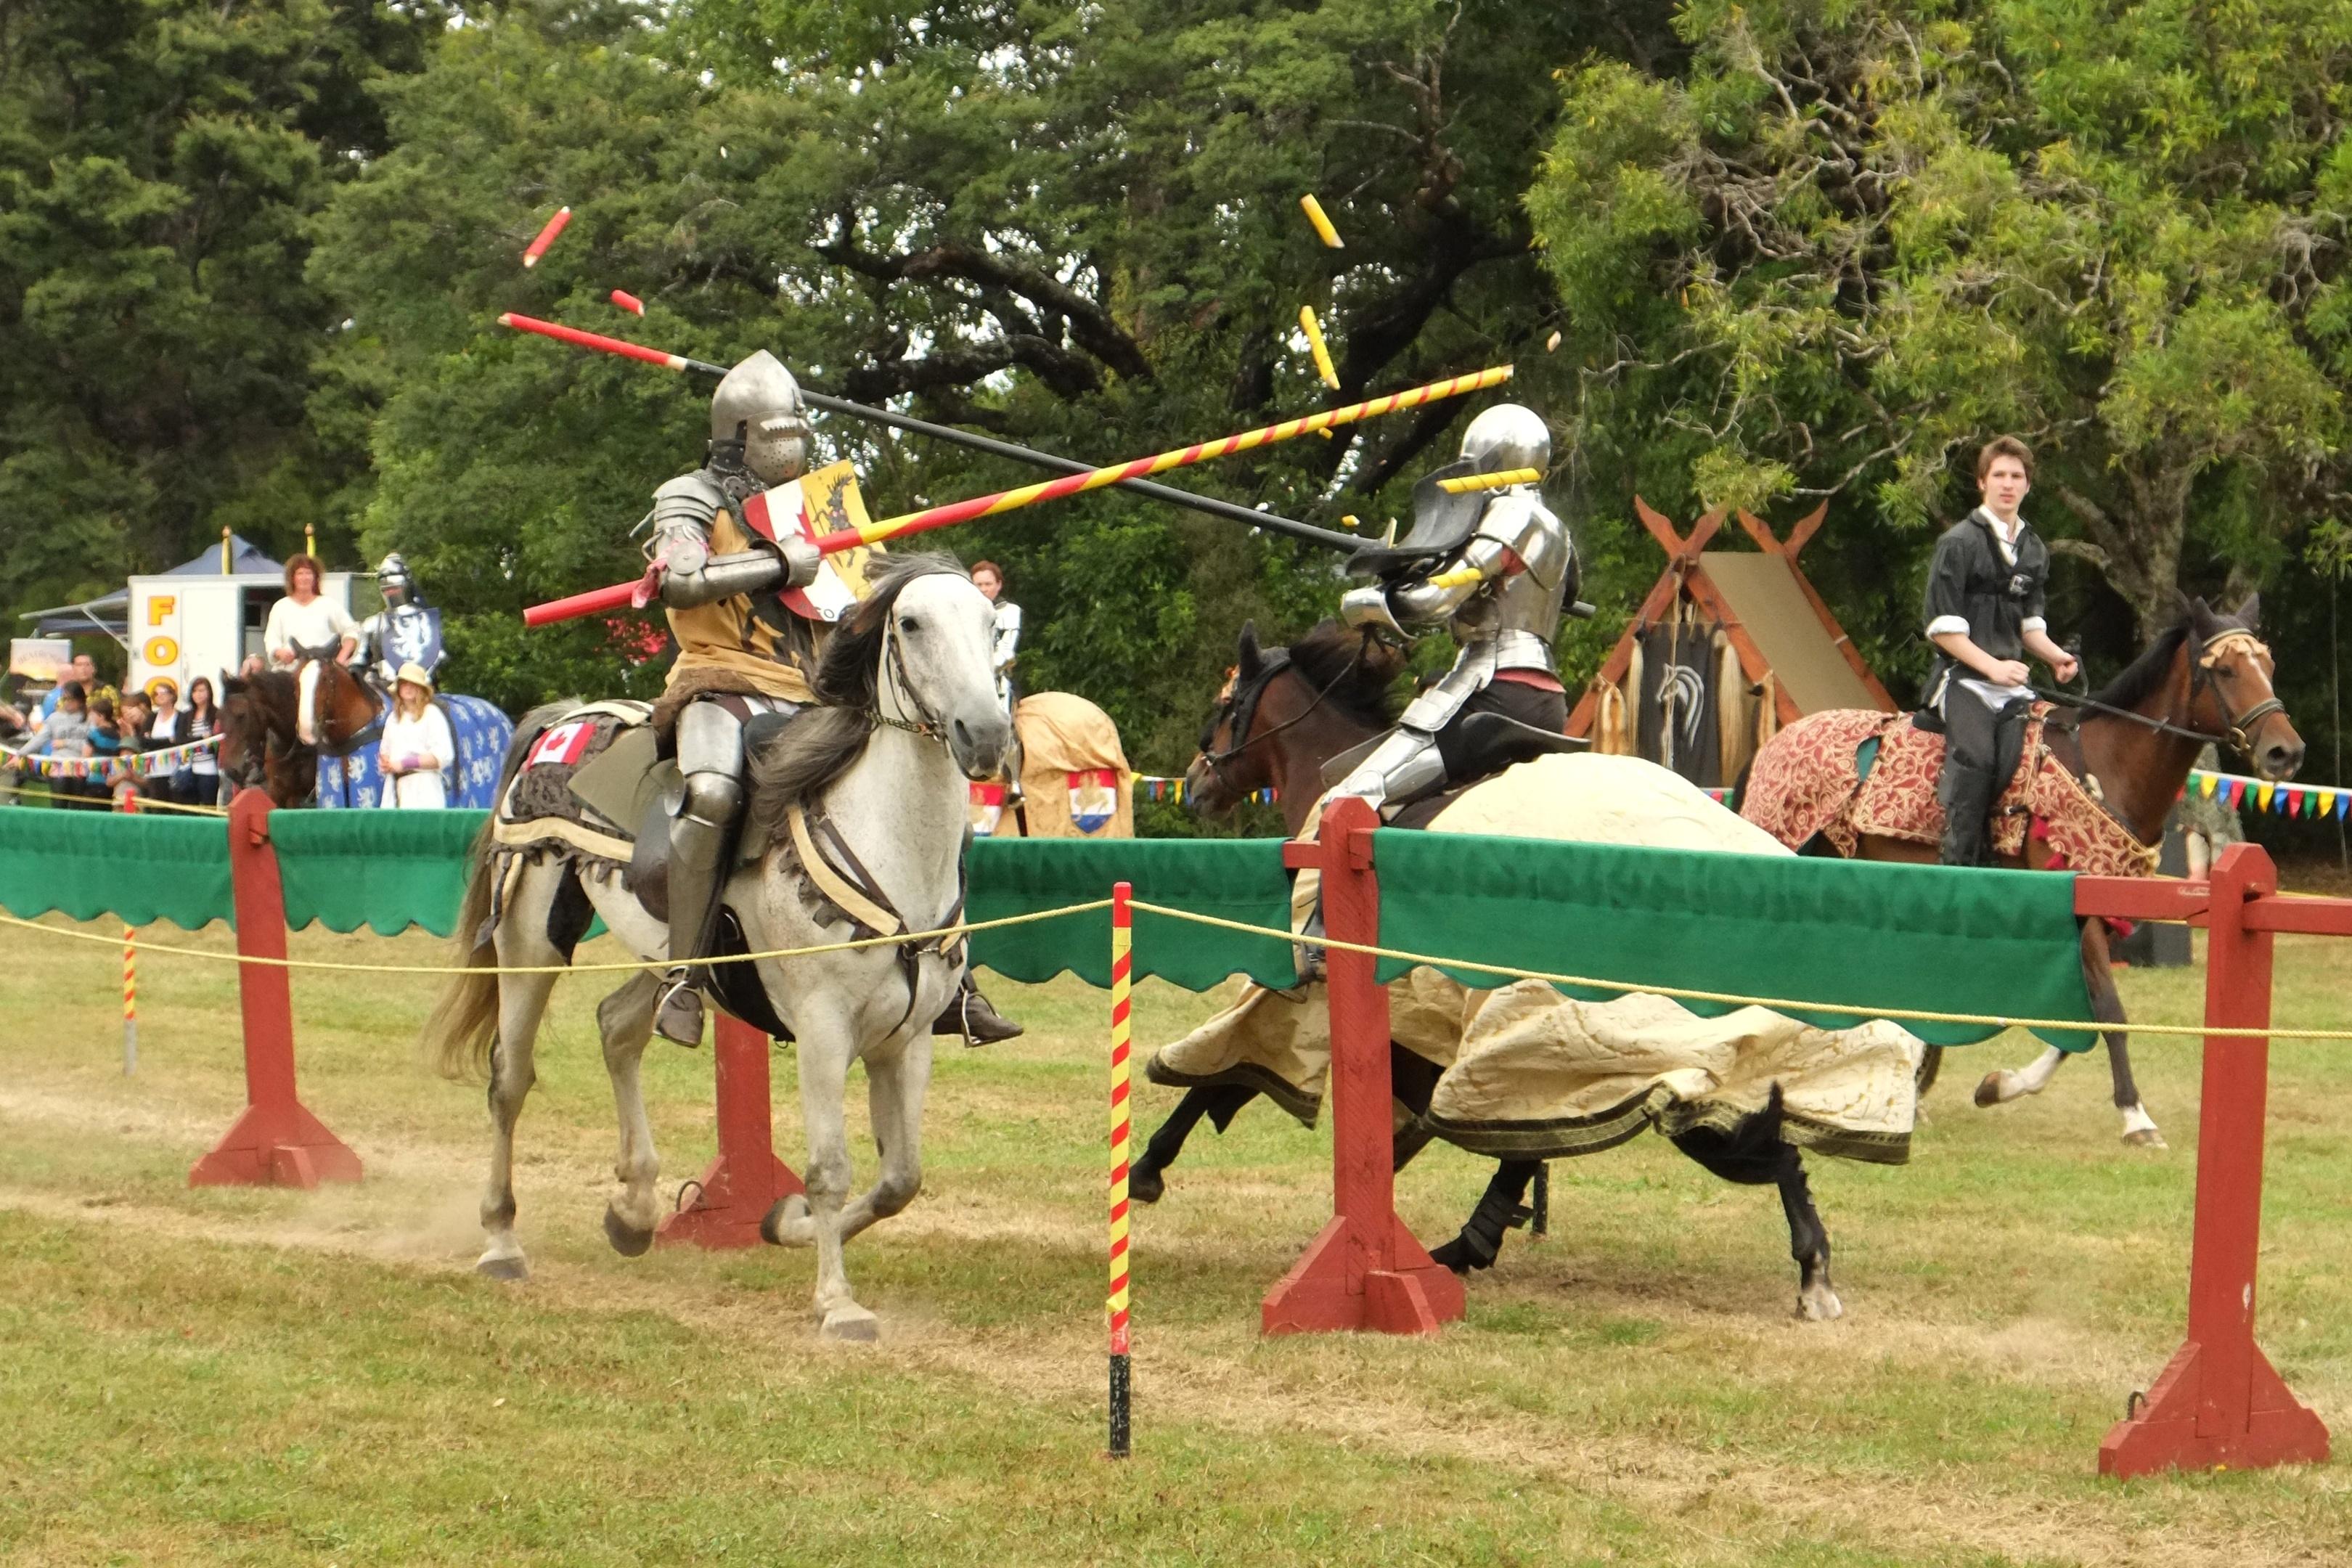 File:Knights jousting, lance tips broken on shields.jpg ...